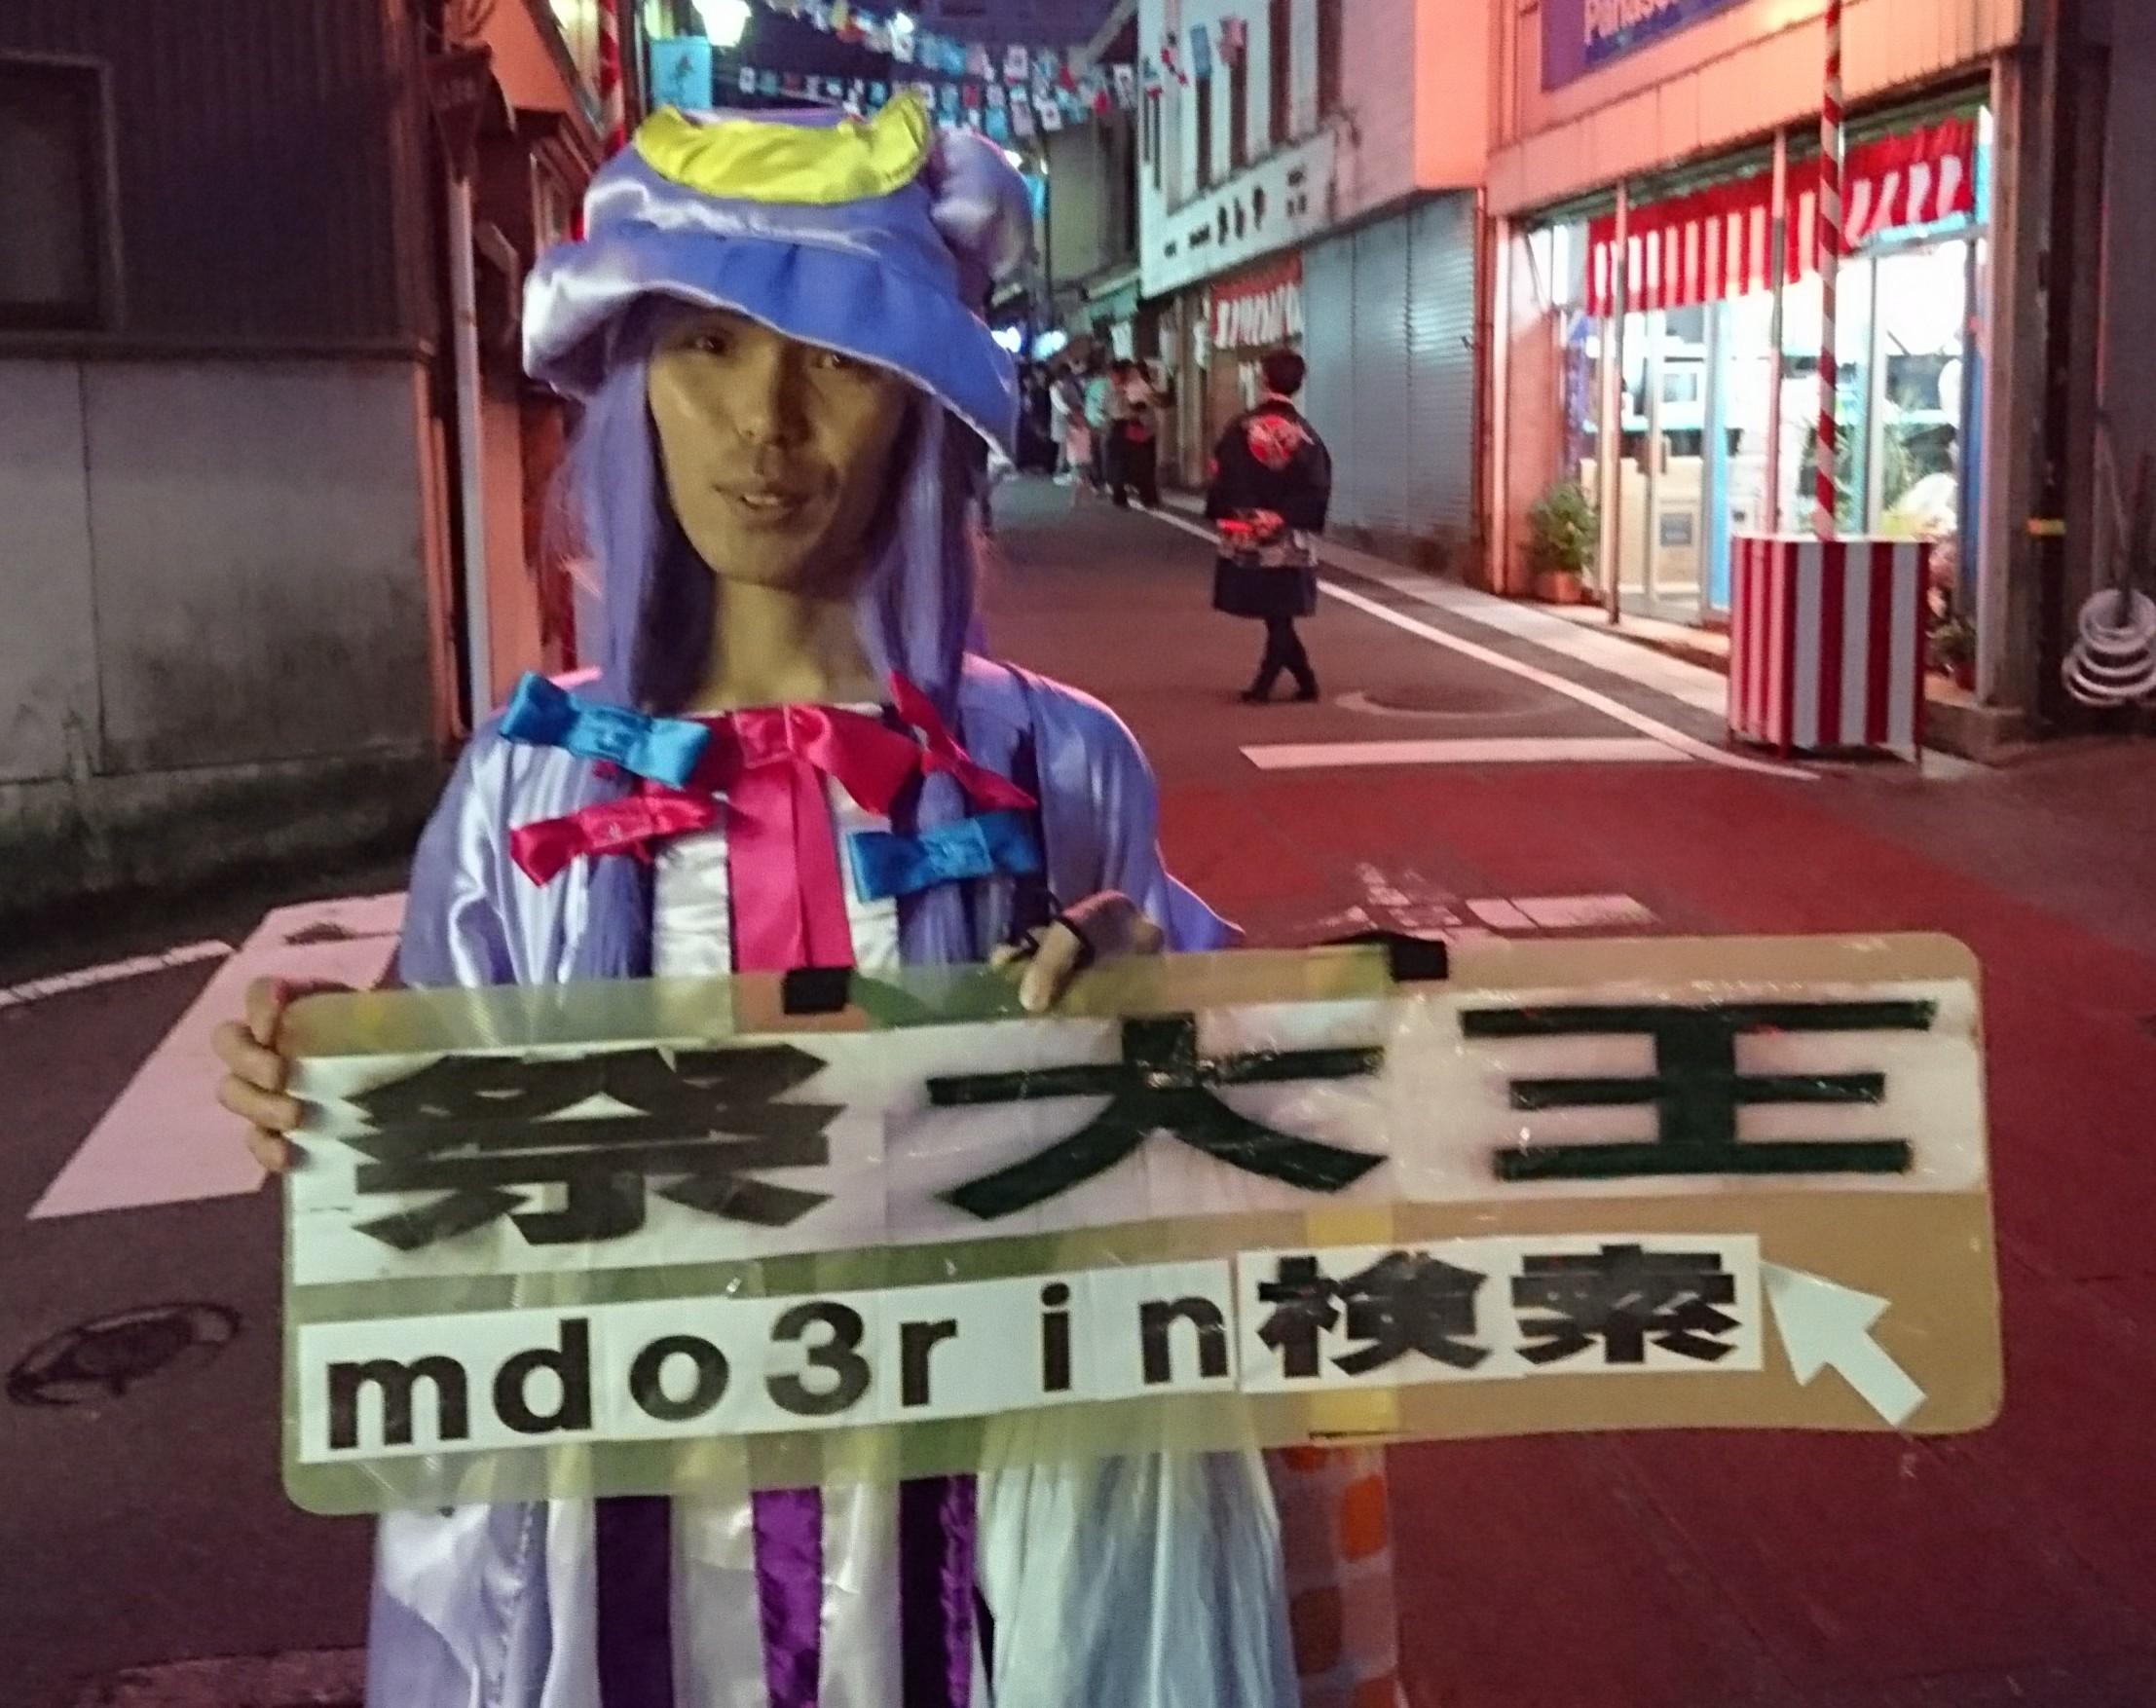 f:id:d-ninja:20170917070930j:image